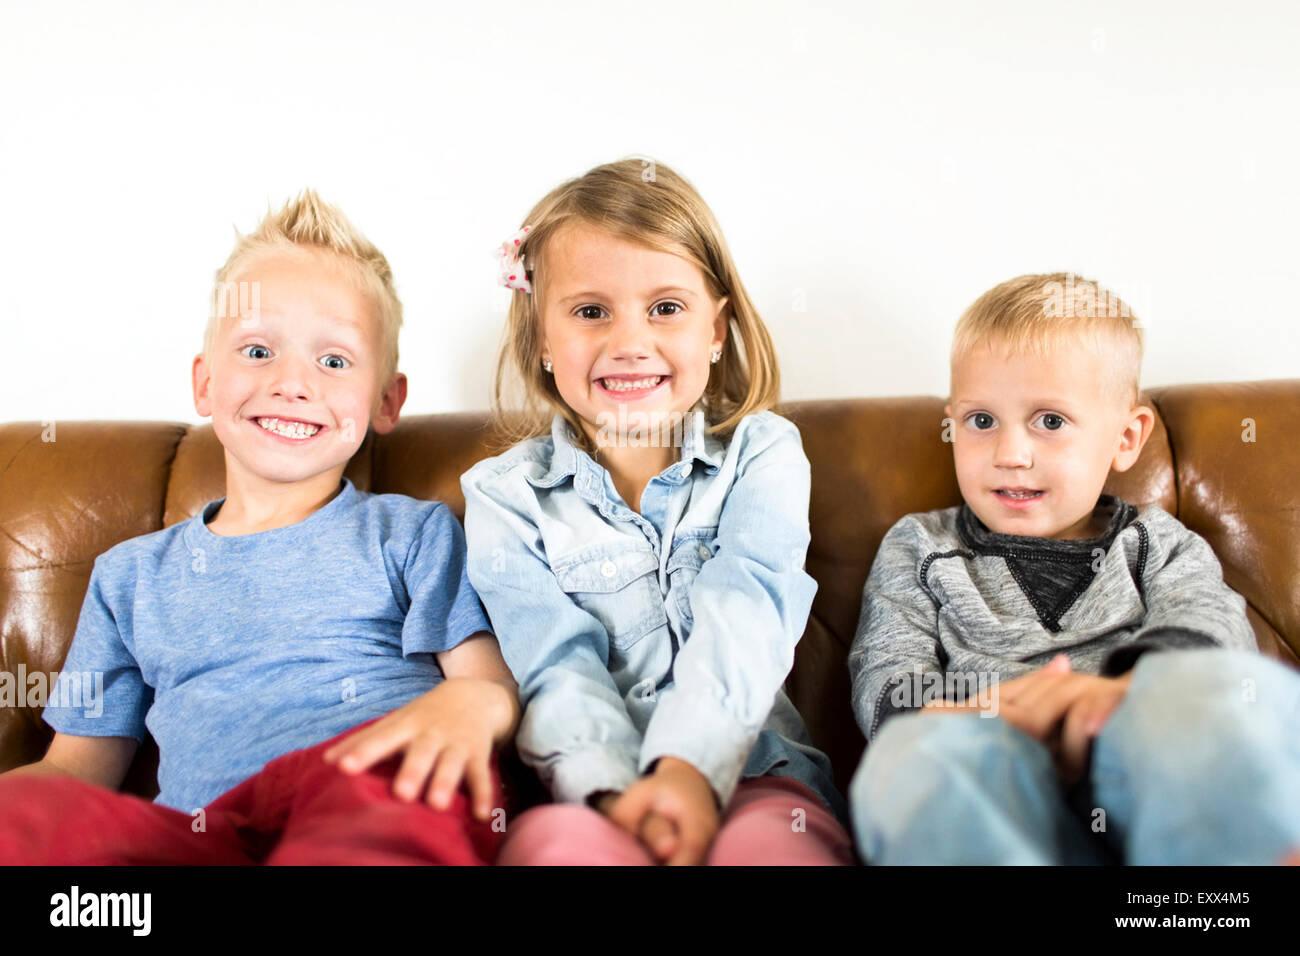 Smiling children (2-3, 4-5) sitting on sofa - Stock Image